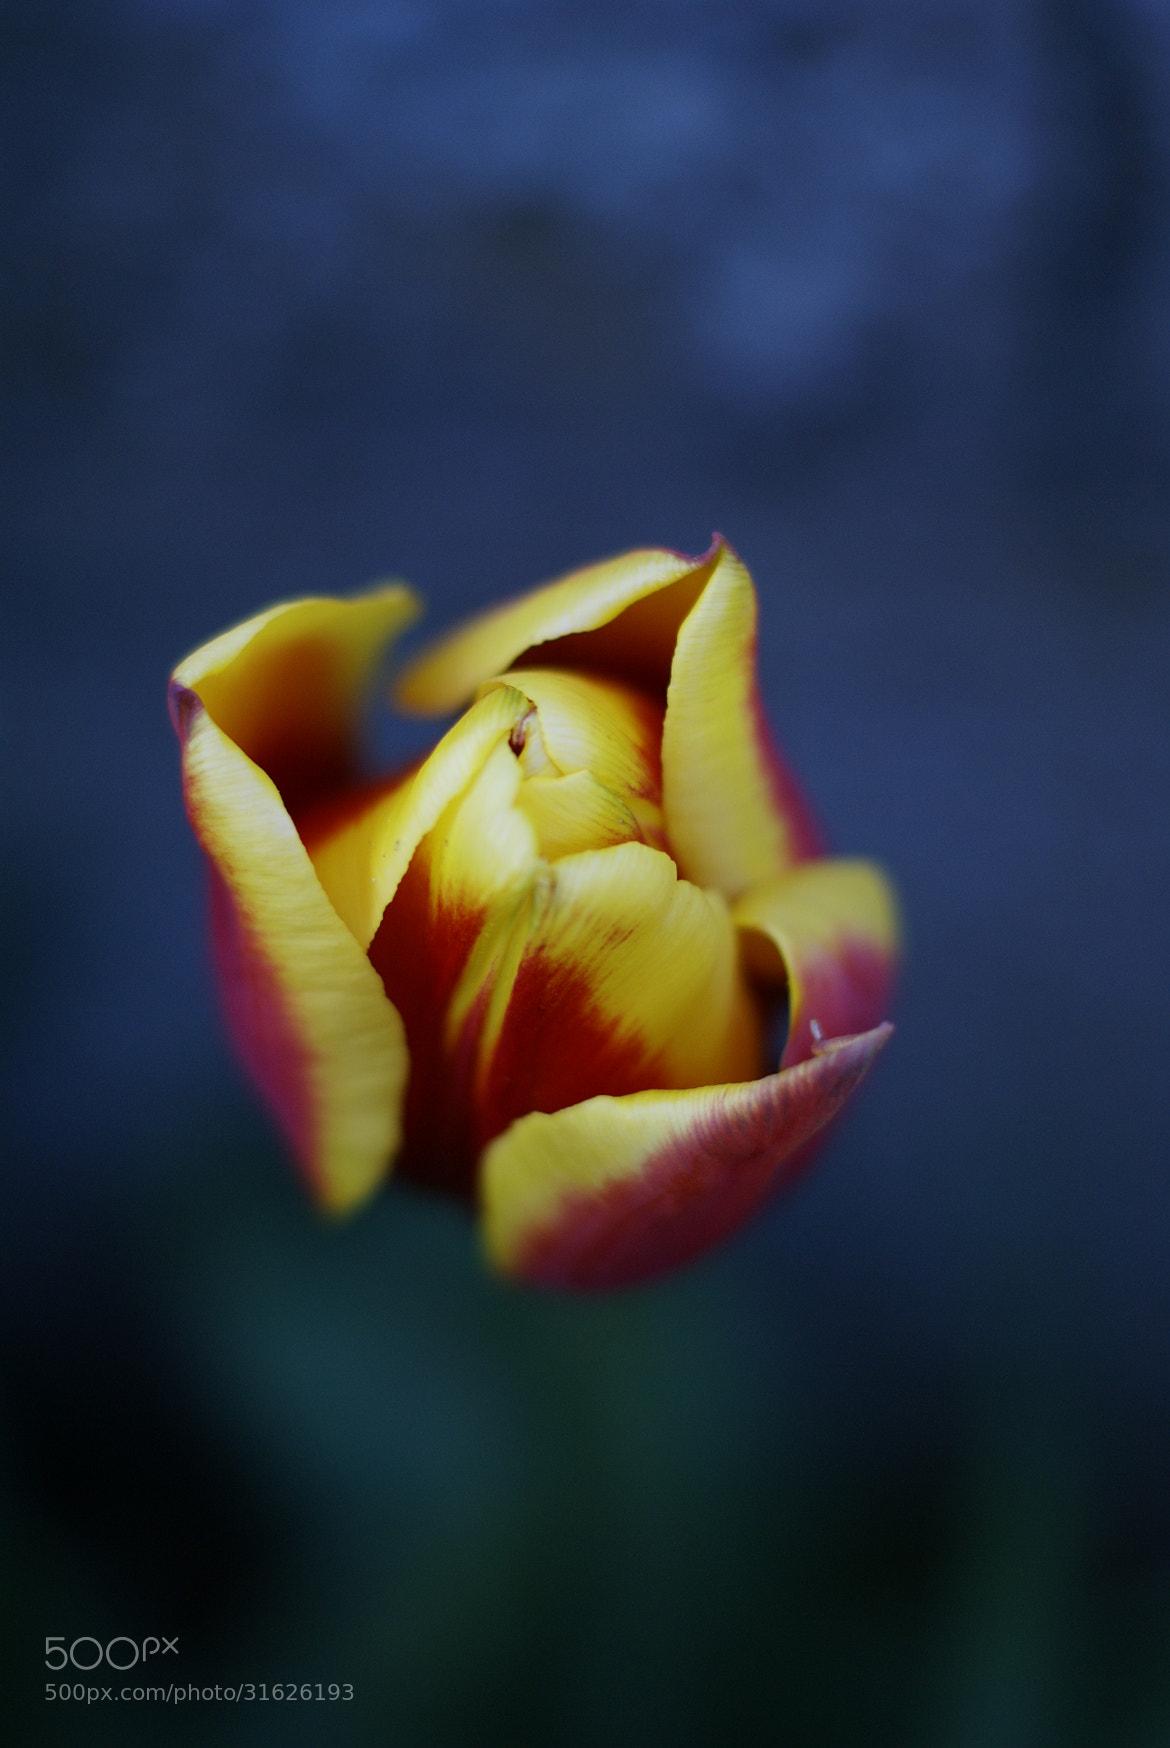 Photograph Tulip by Nico las on 500px